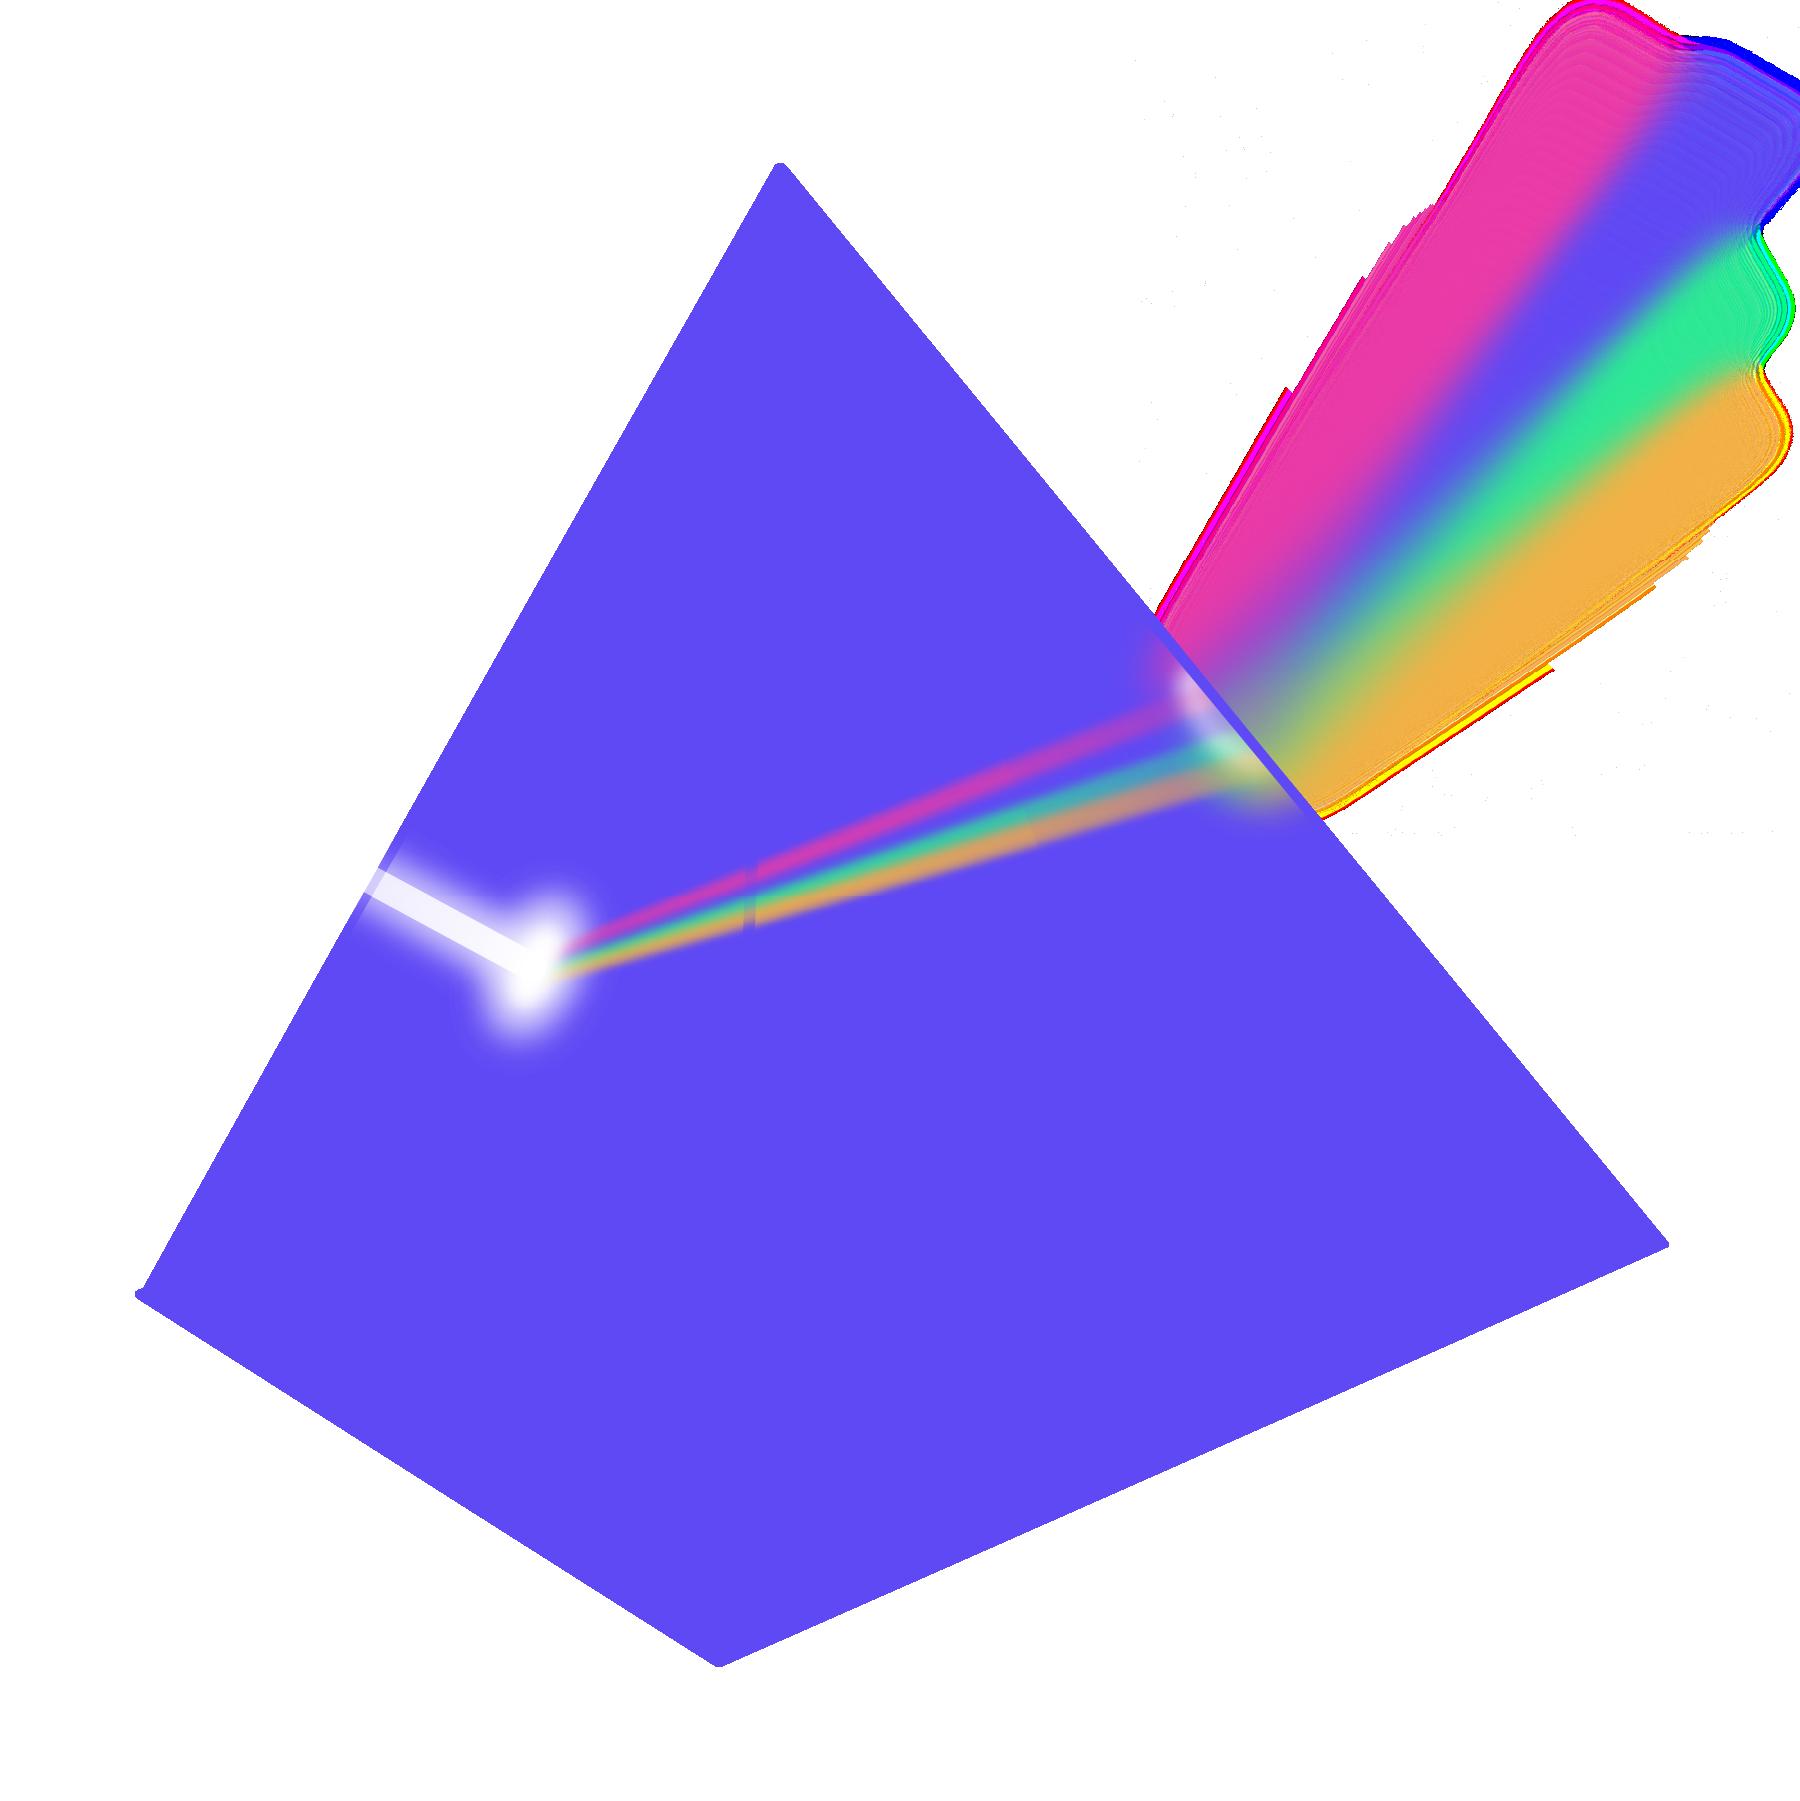 Prism filtering light